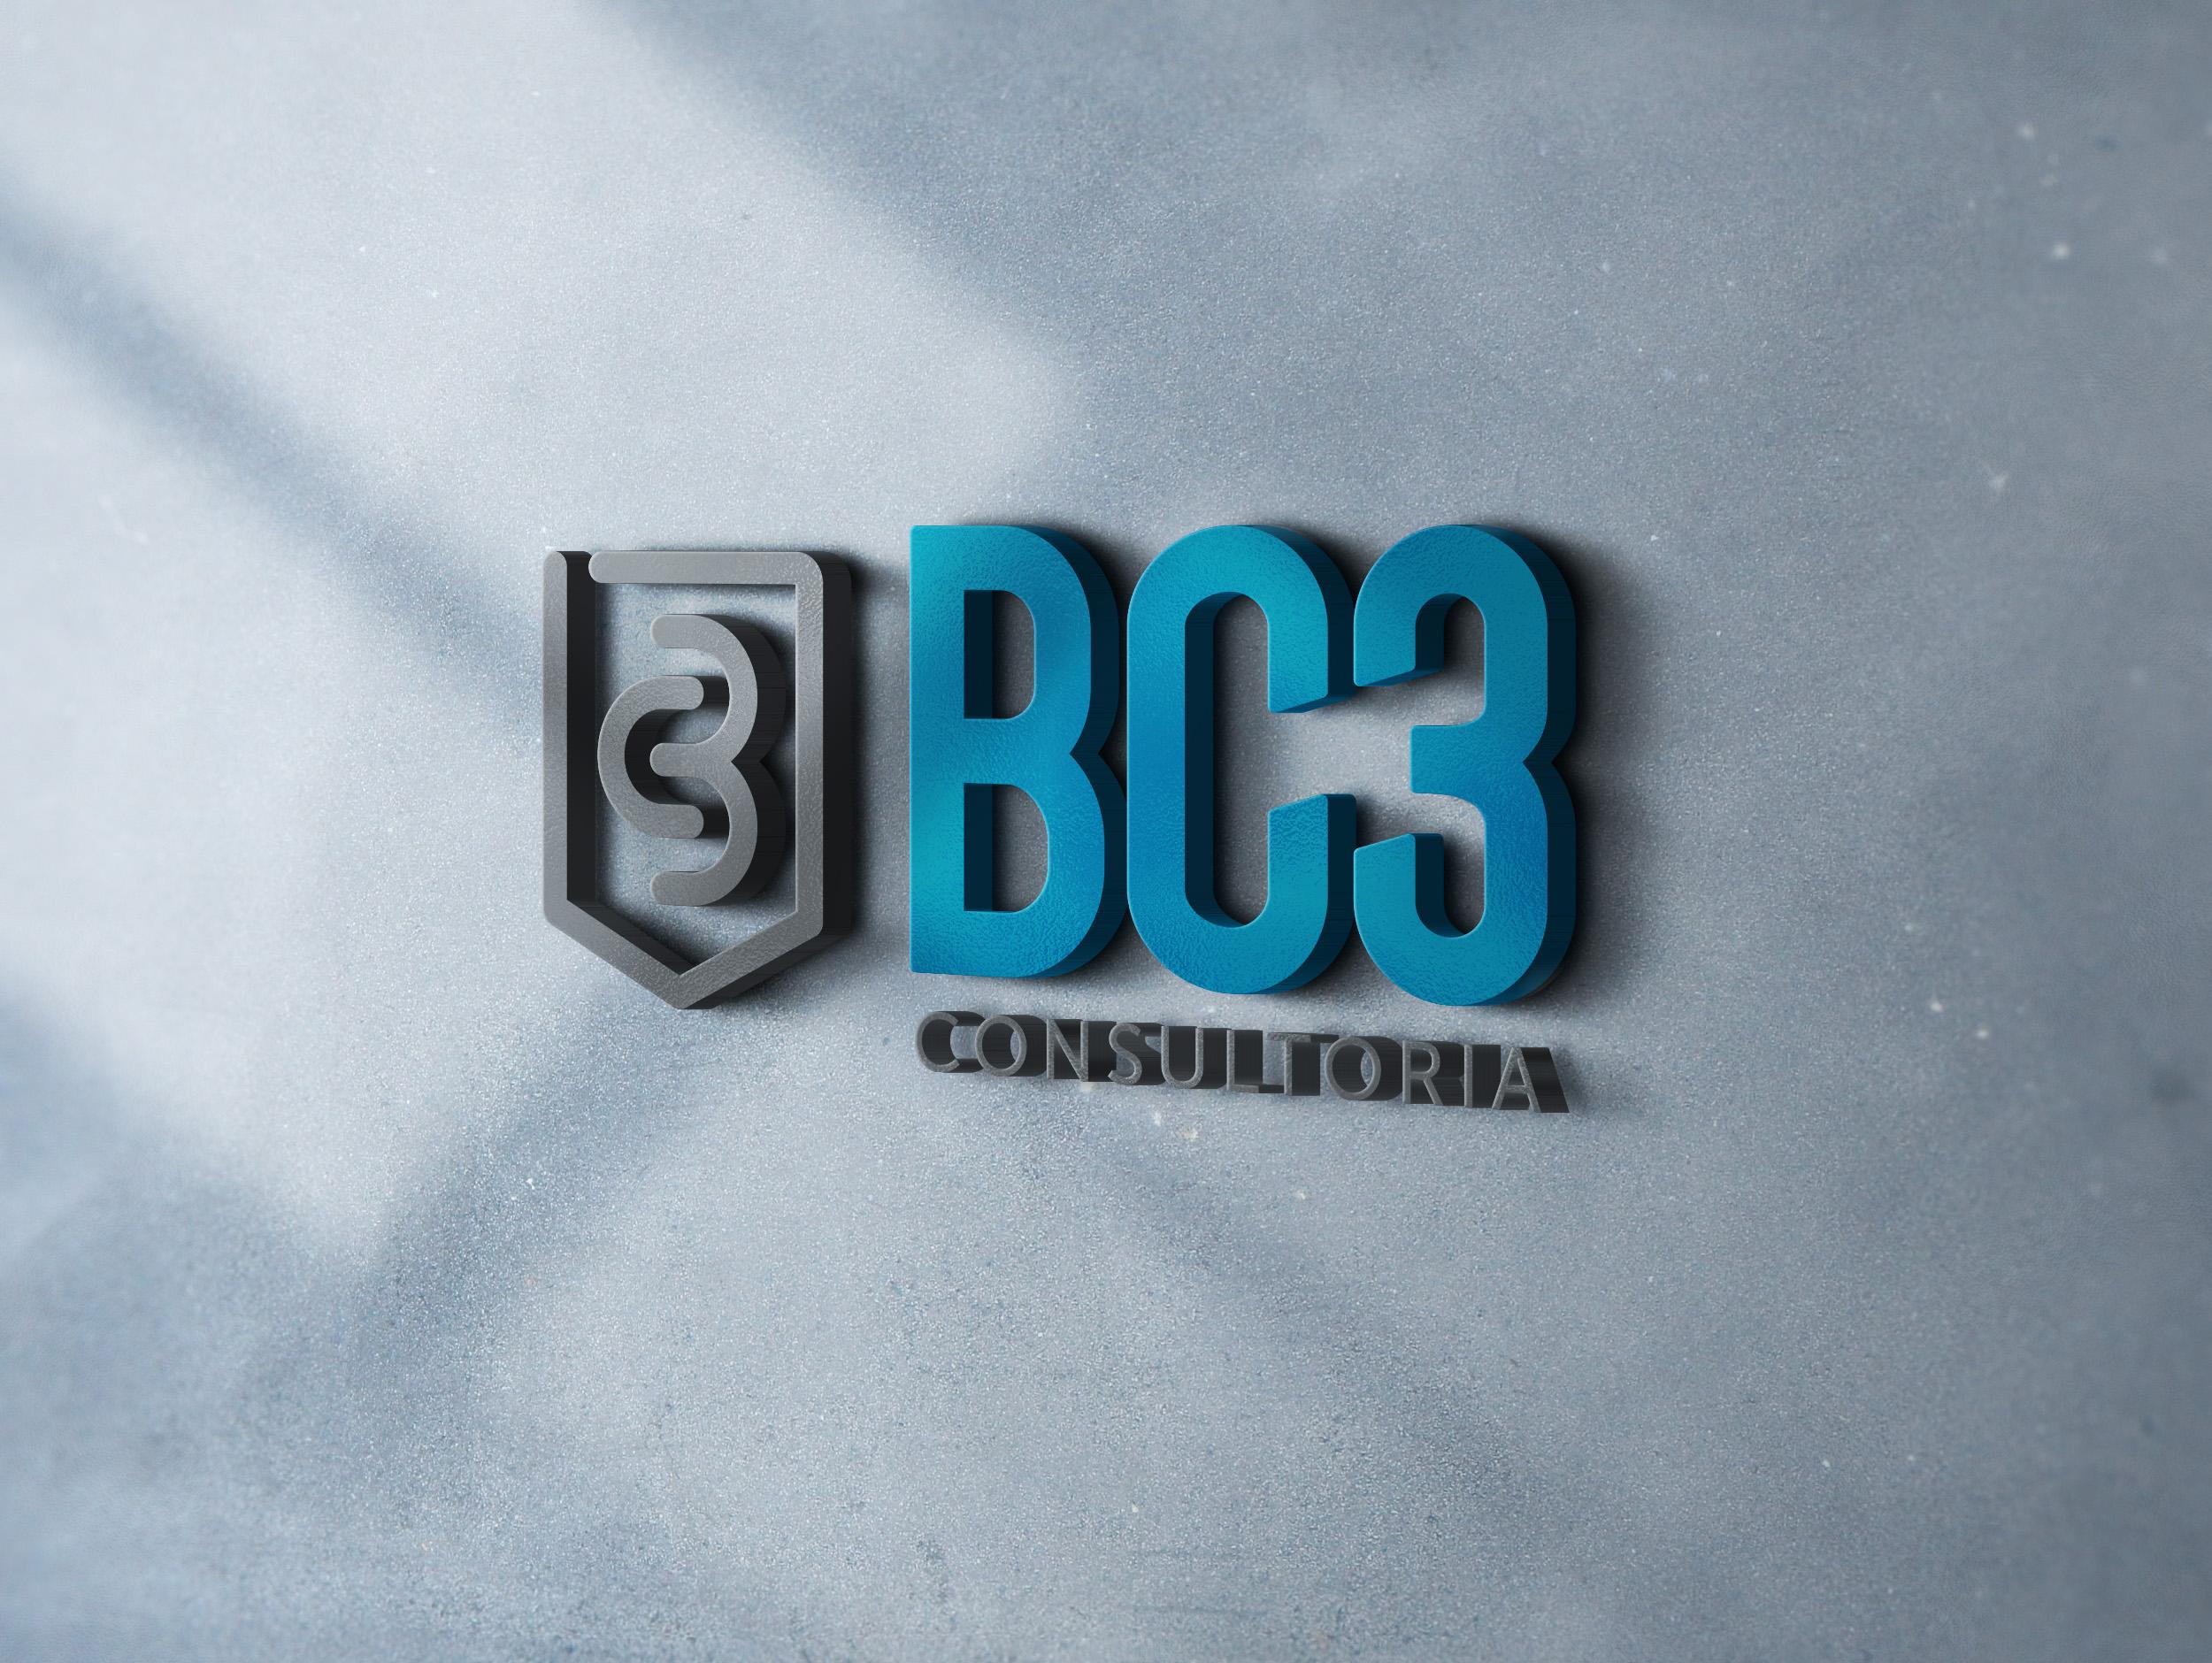 tempero_bc3-consultoria_05